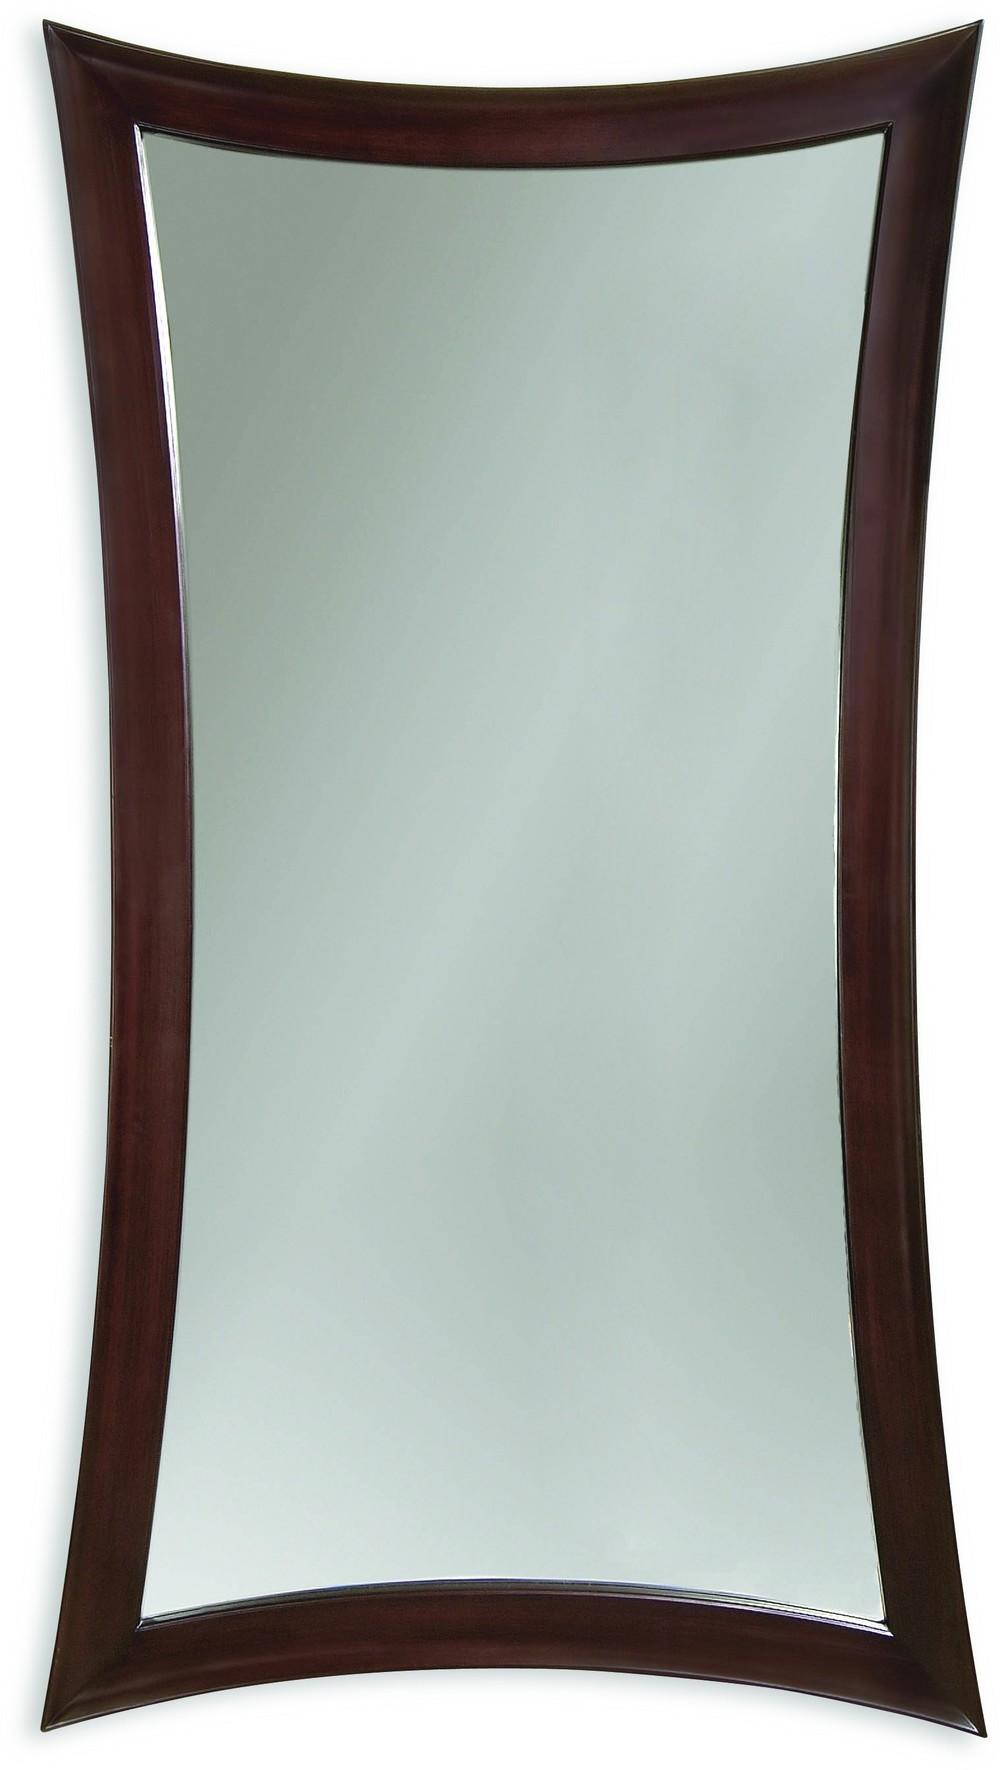 Bassett Mirror Company - Hour Glass Leaner Mirror